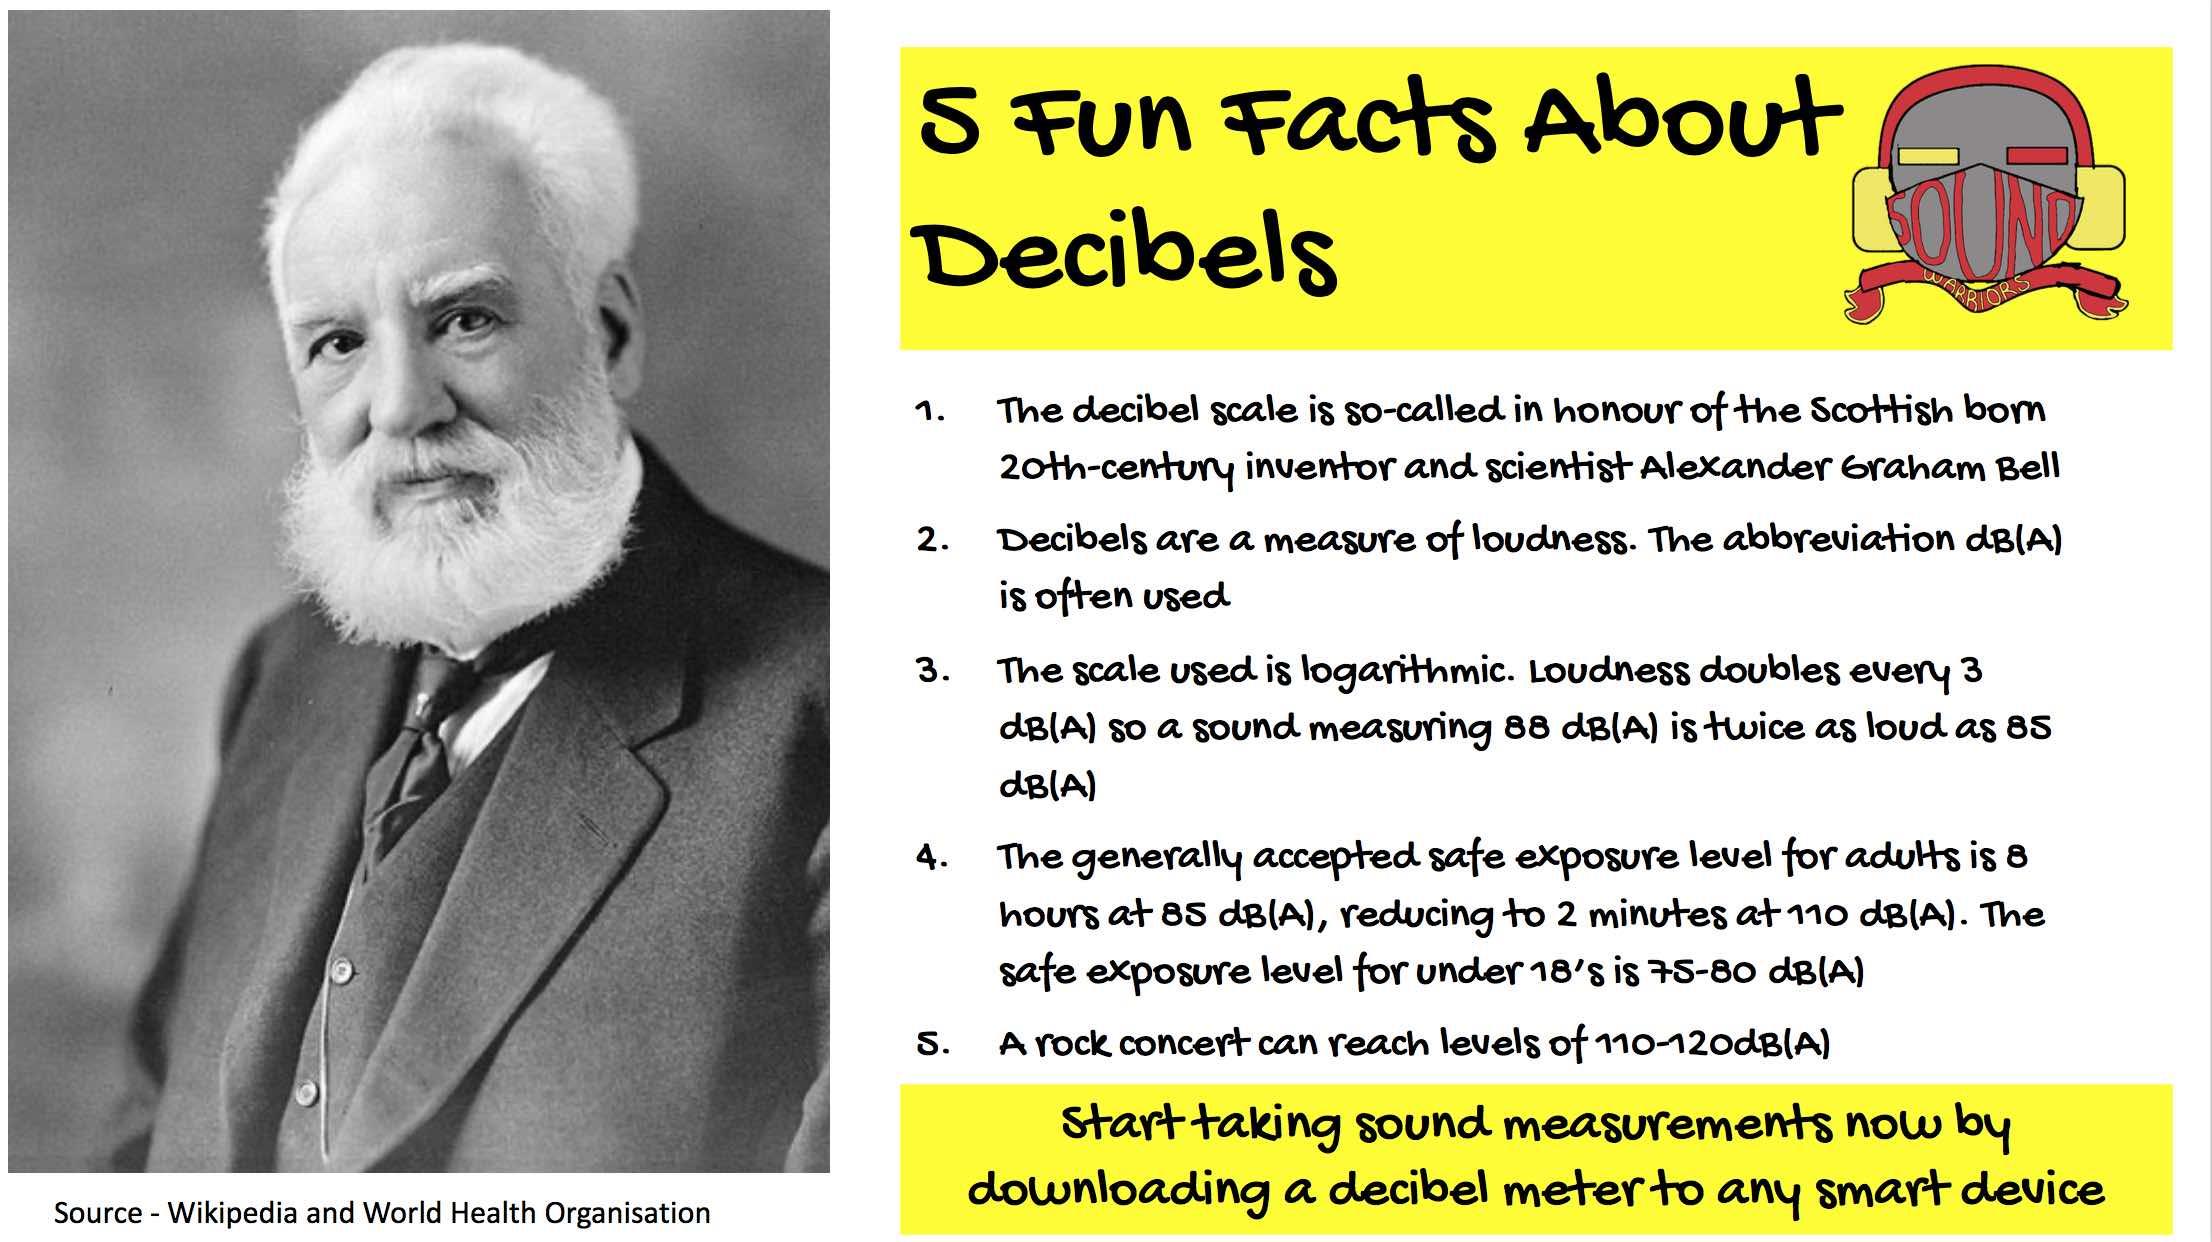 5 Fun Facts About Decibels